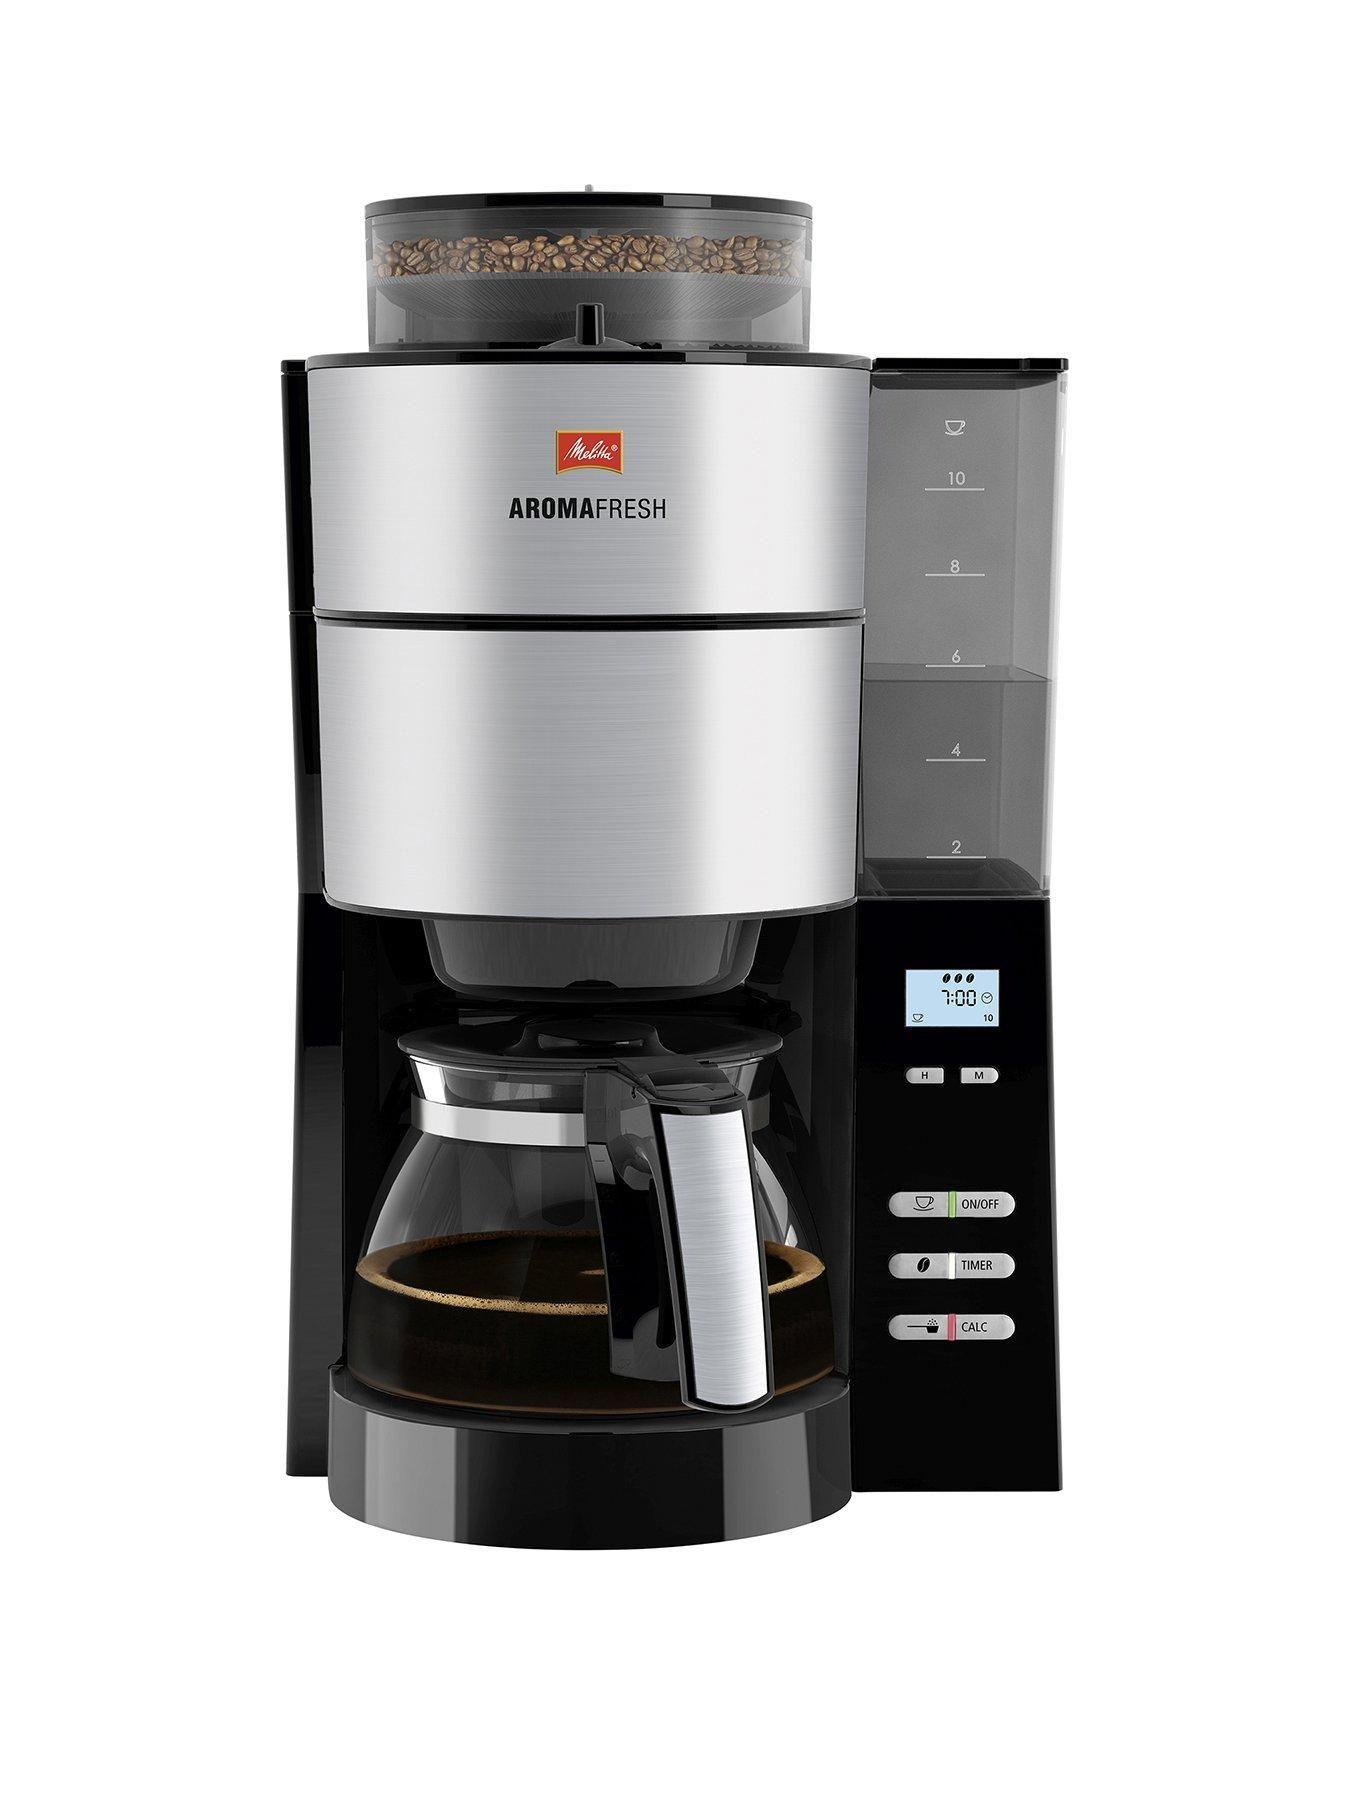 Melitta Melitta Aromafresh Grind And Brew Filter Coffee